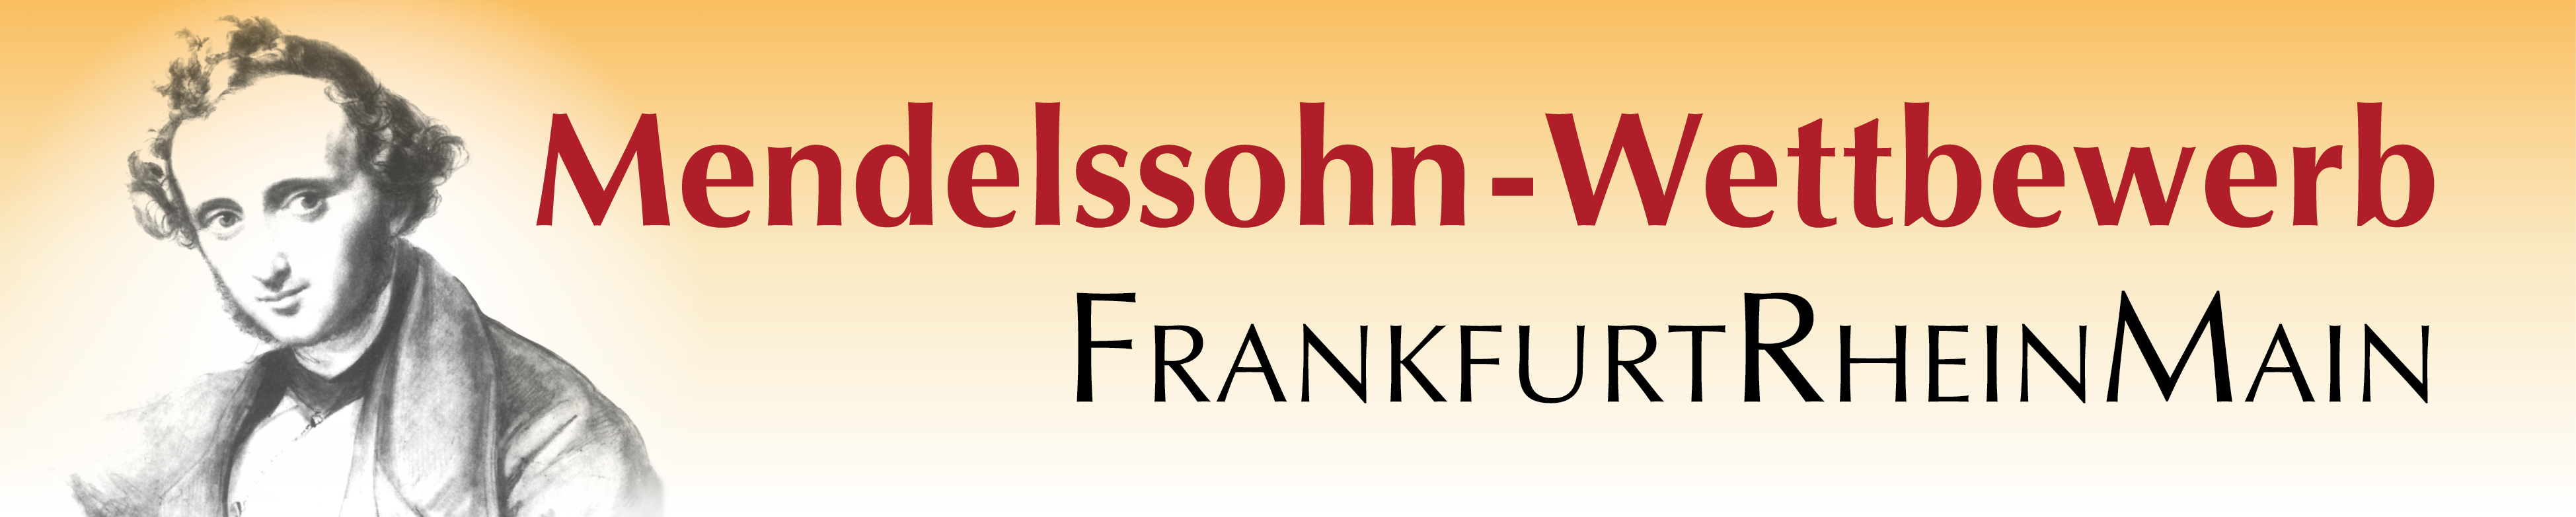 Mendelssohn-Wettbewerb.de